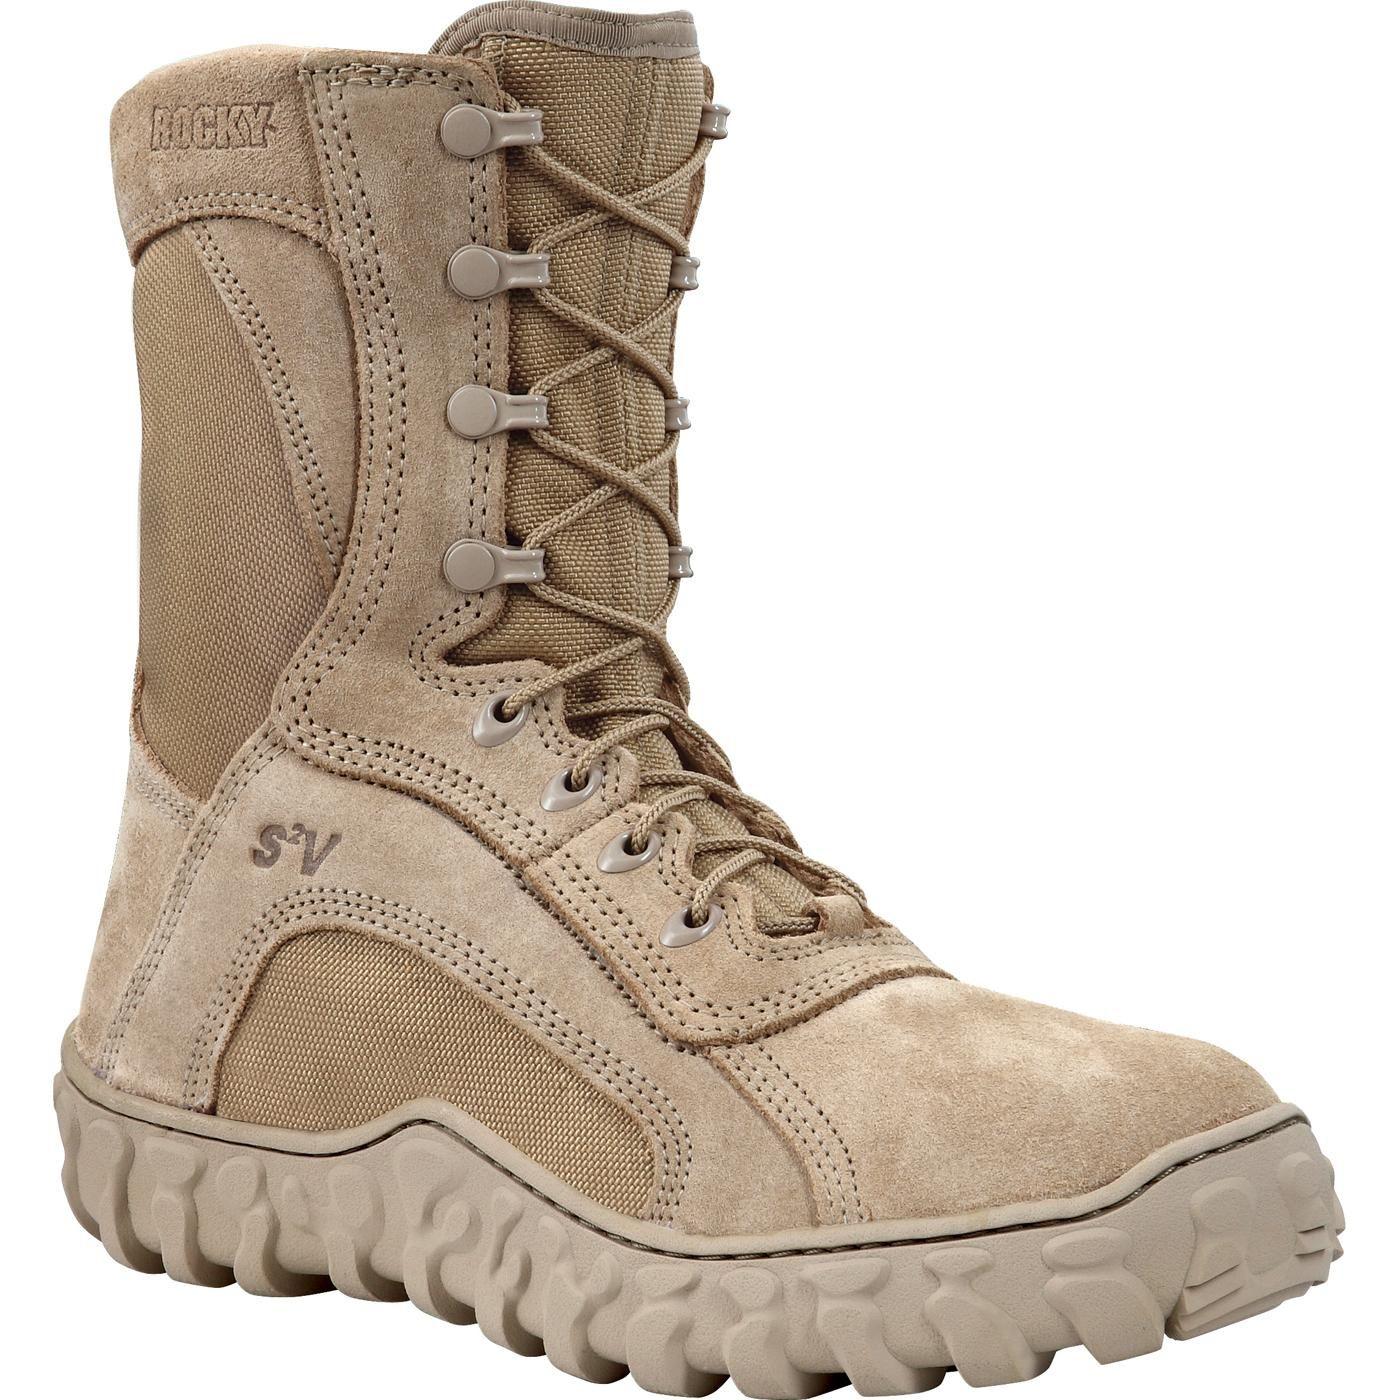 21++ Military steel toe boots ideas info